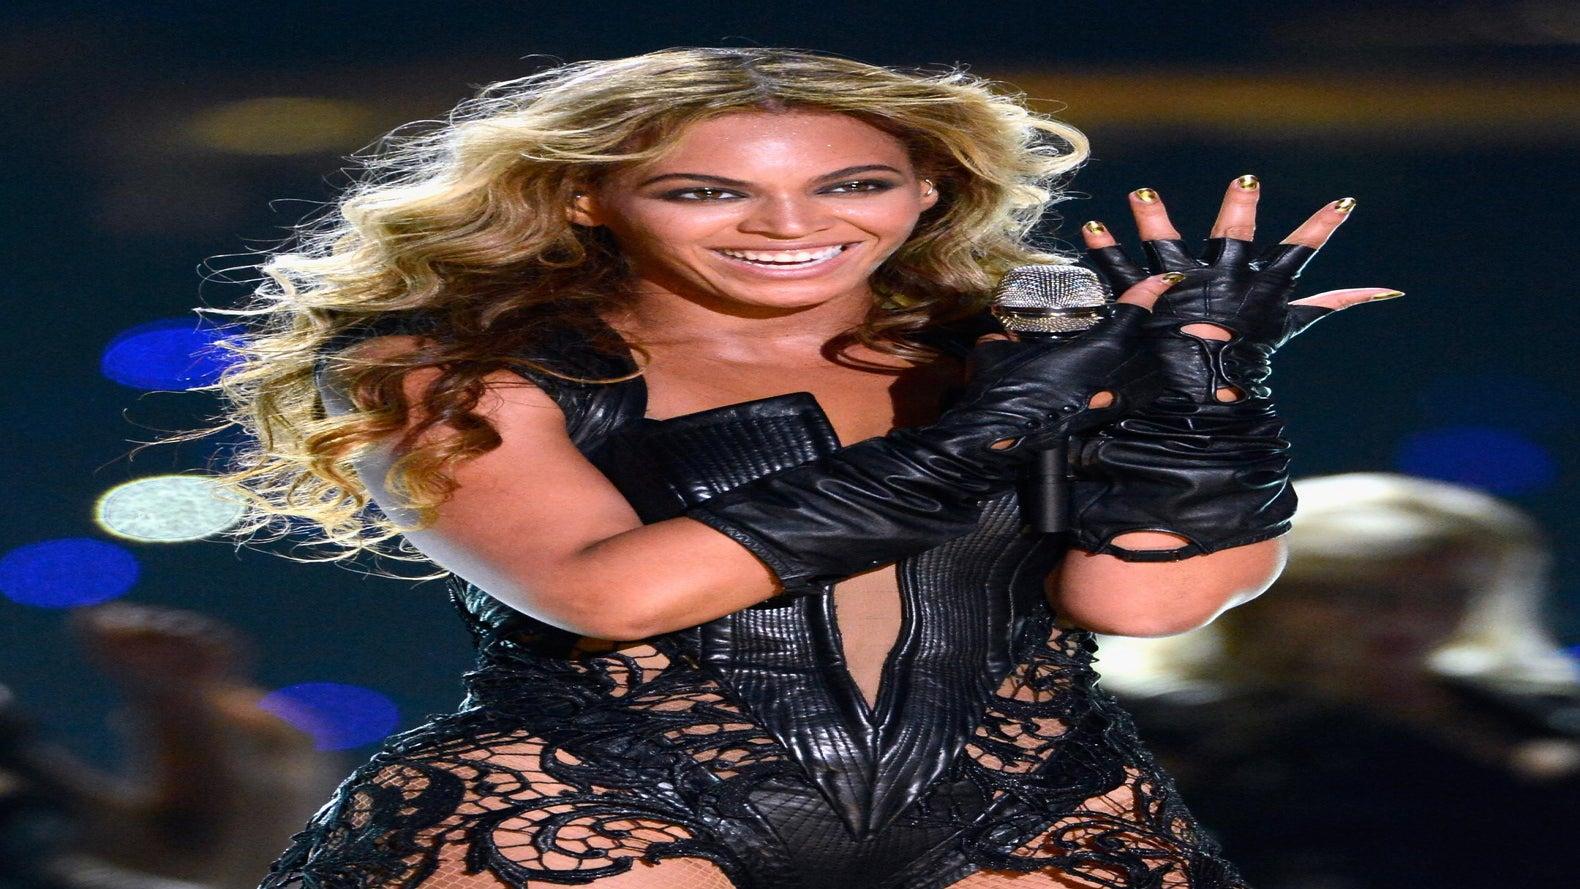 Beyoncé to Headline the 2013 ESSENCE Festival